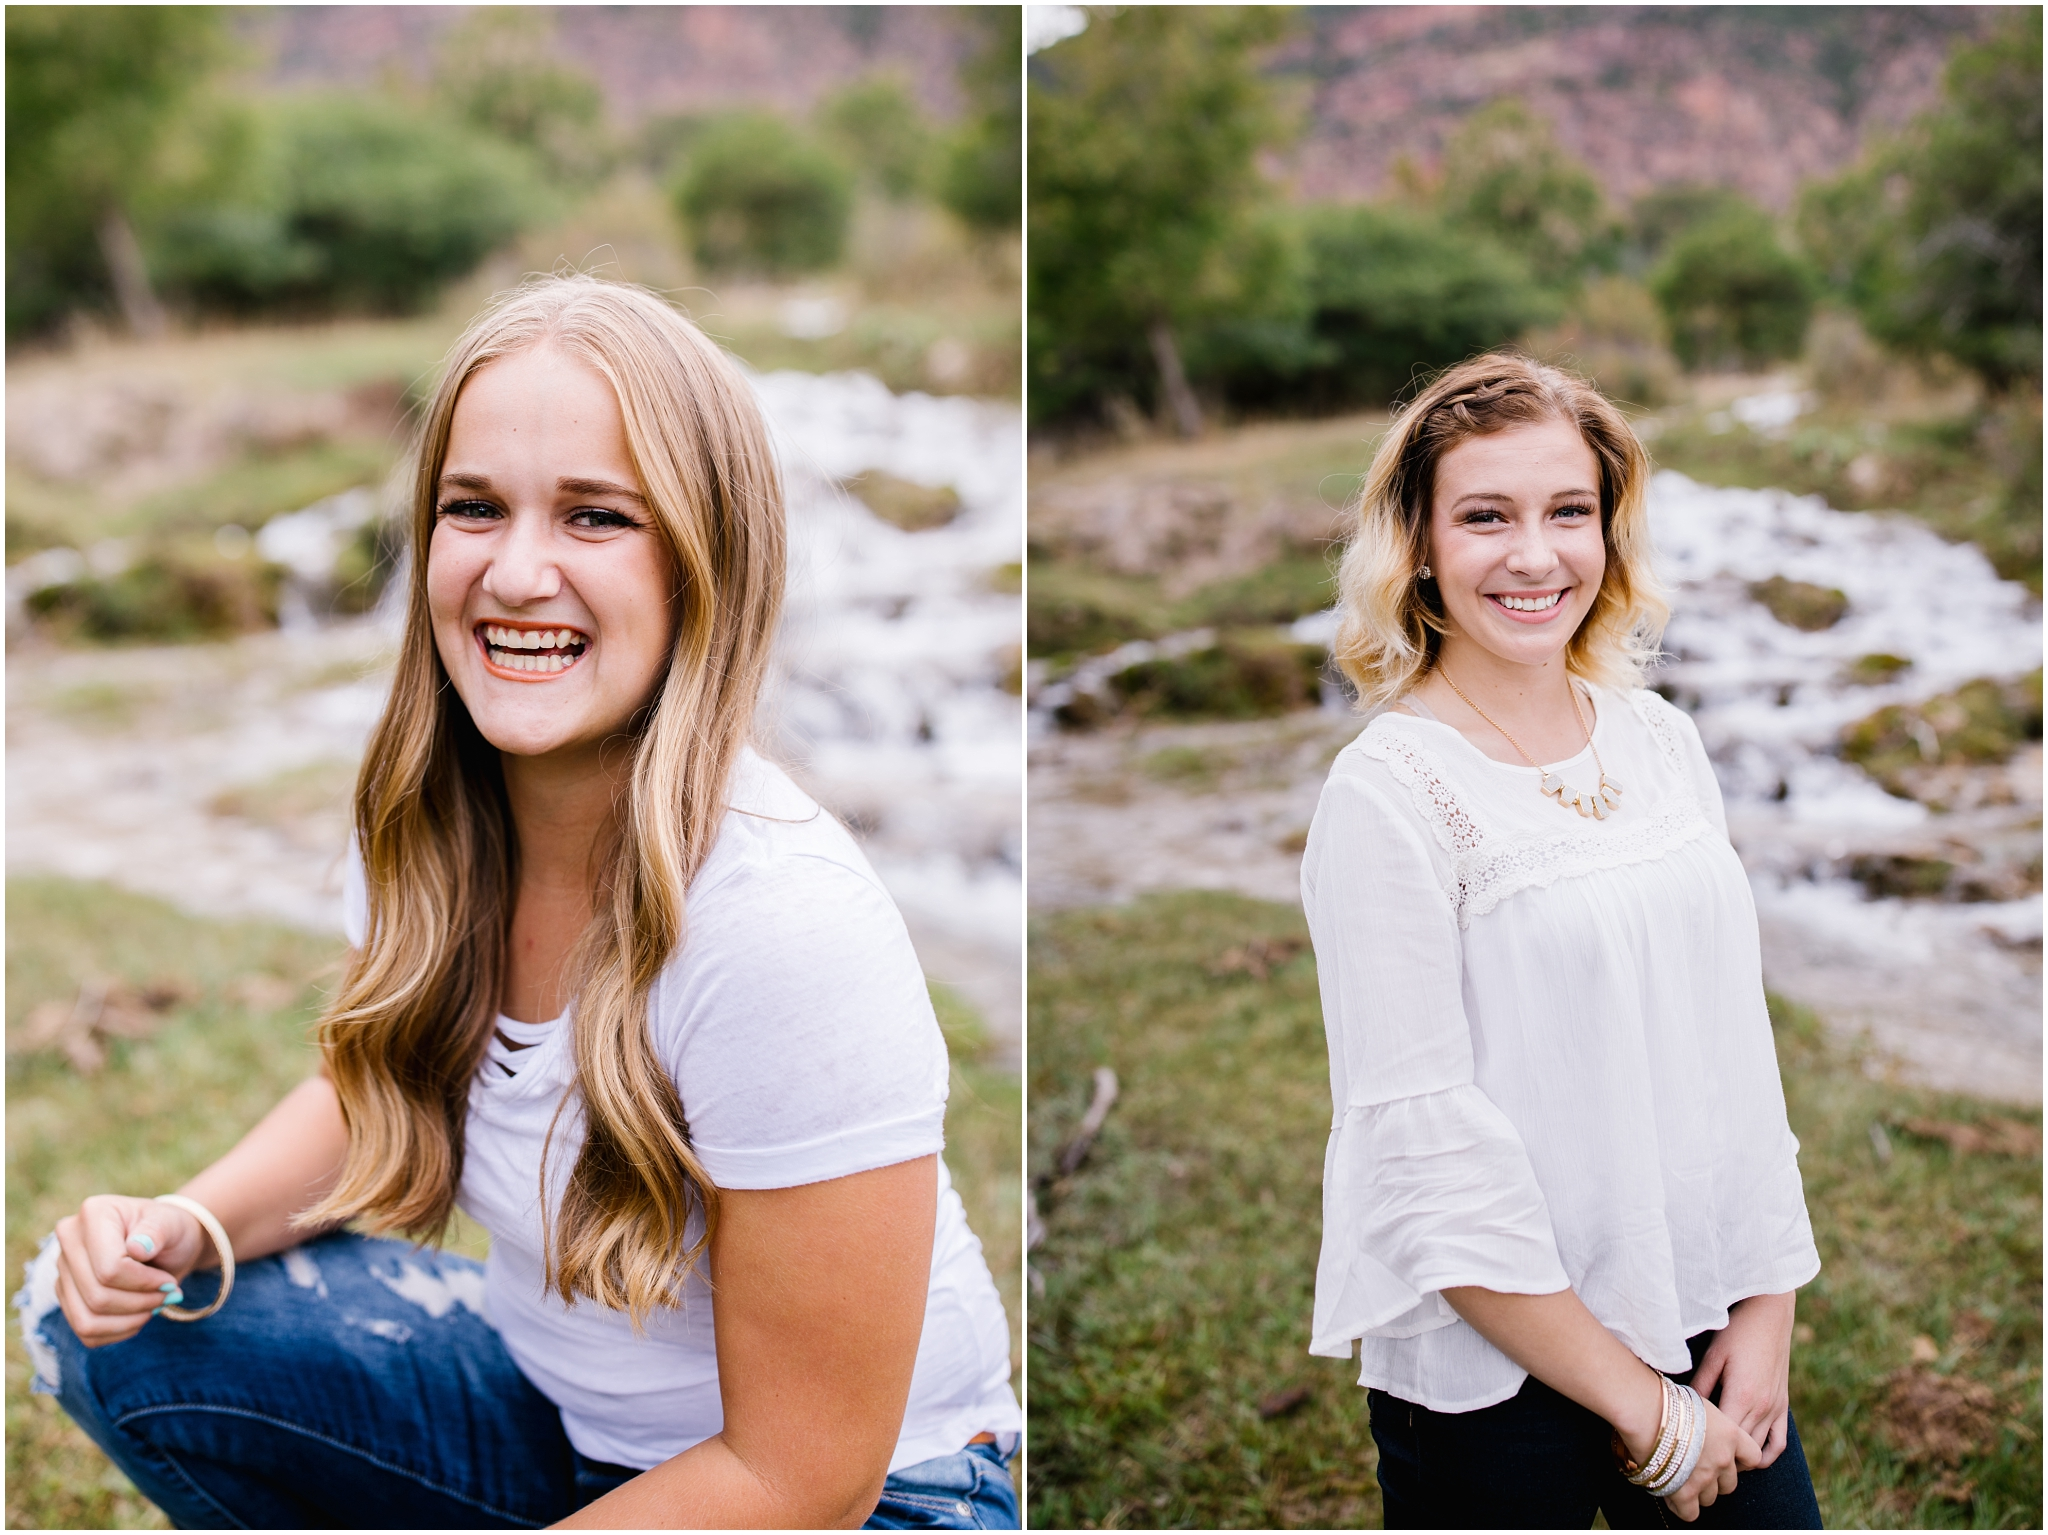 GVHSDRILL-73_Lizzie-B-Imagery-Utah-Family-Photographer-Central-Utah-Park-City-Salt-Lake-City-Drill-Team-Photography-Dance.jpg